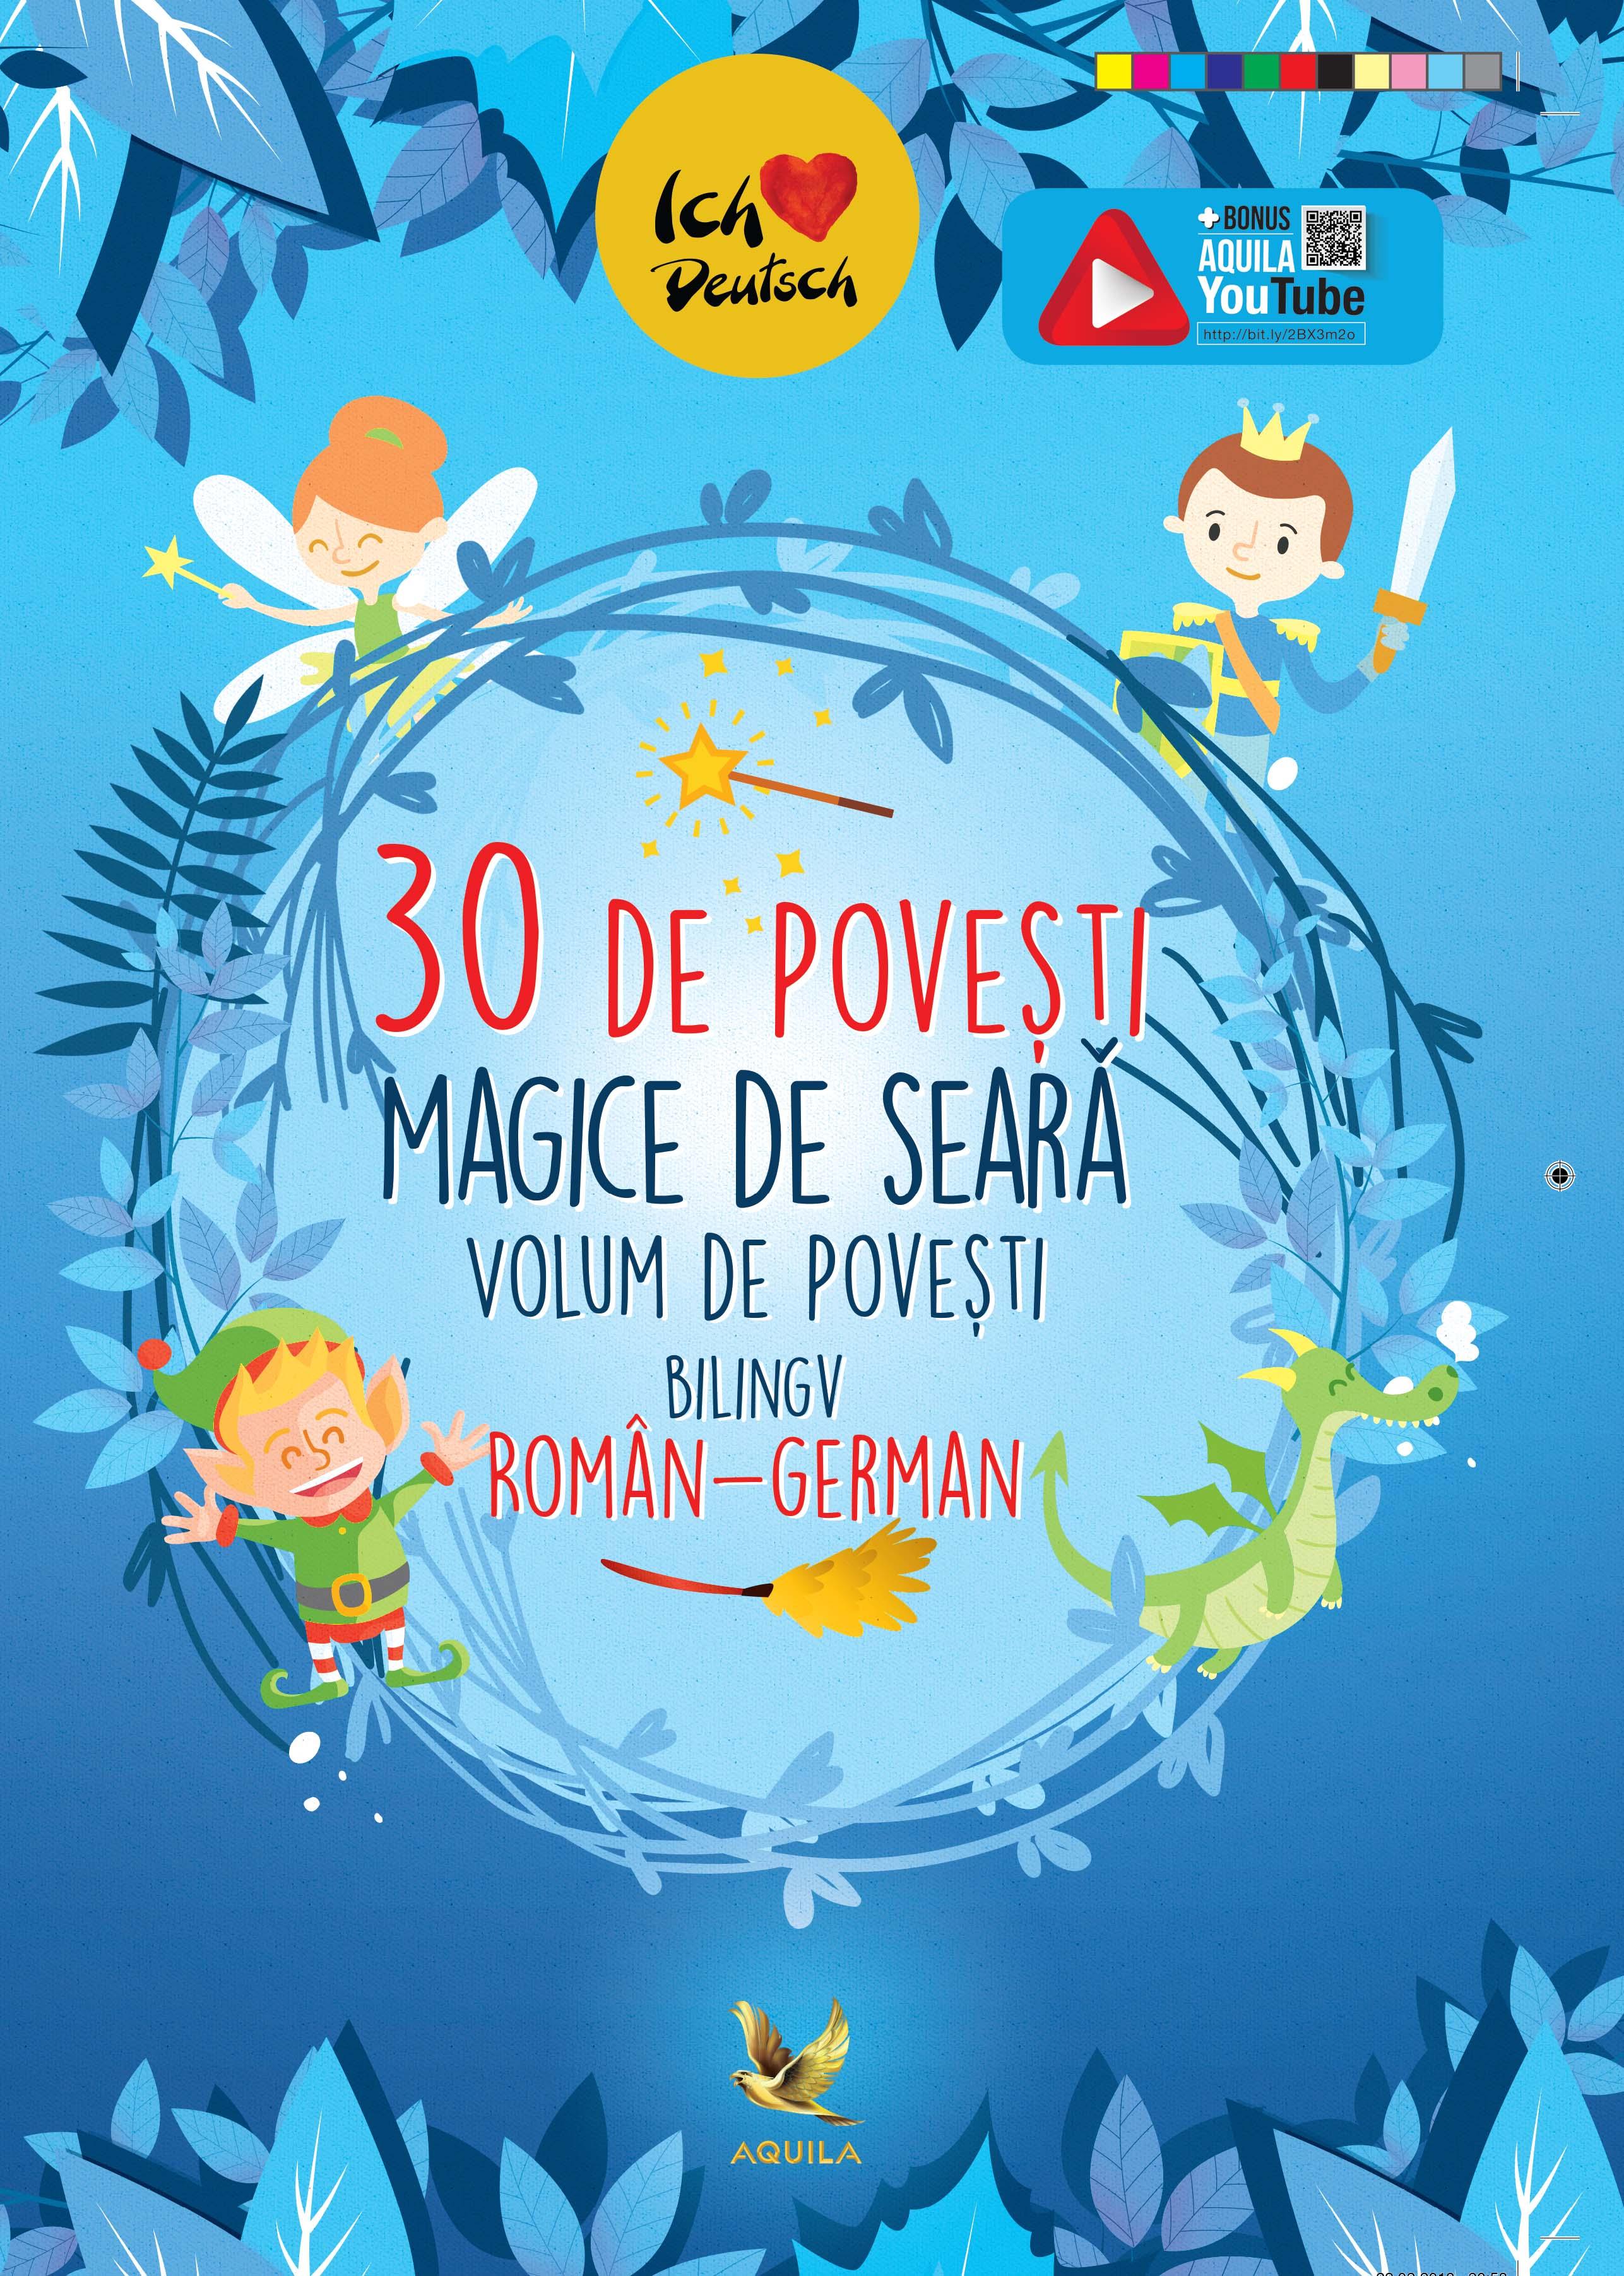 30 De Povesti Magice De Seara |